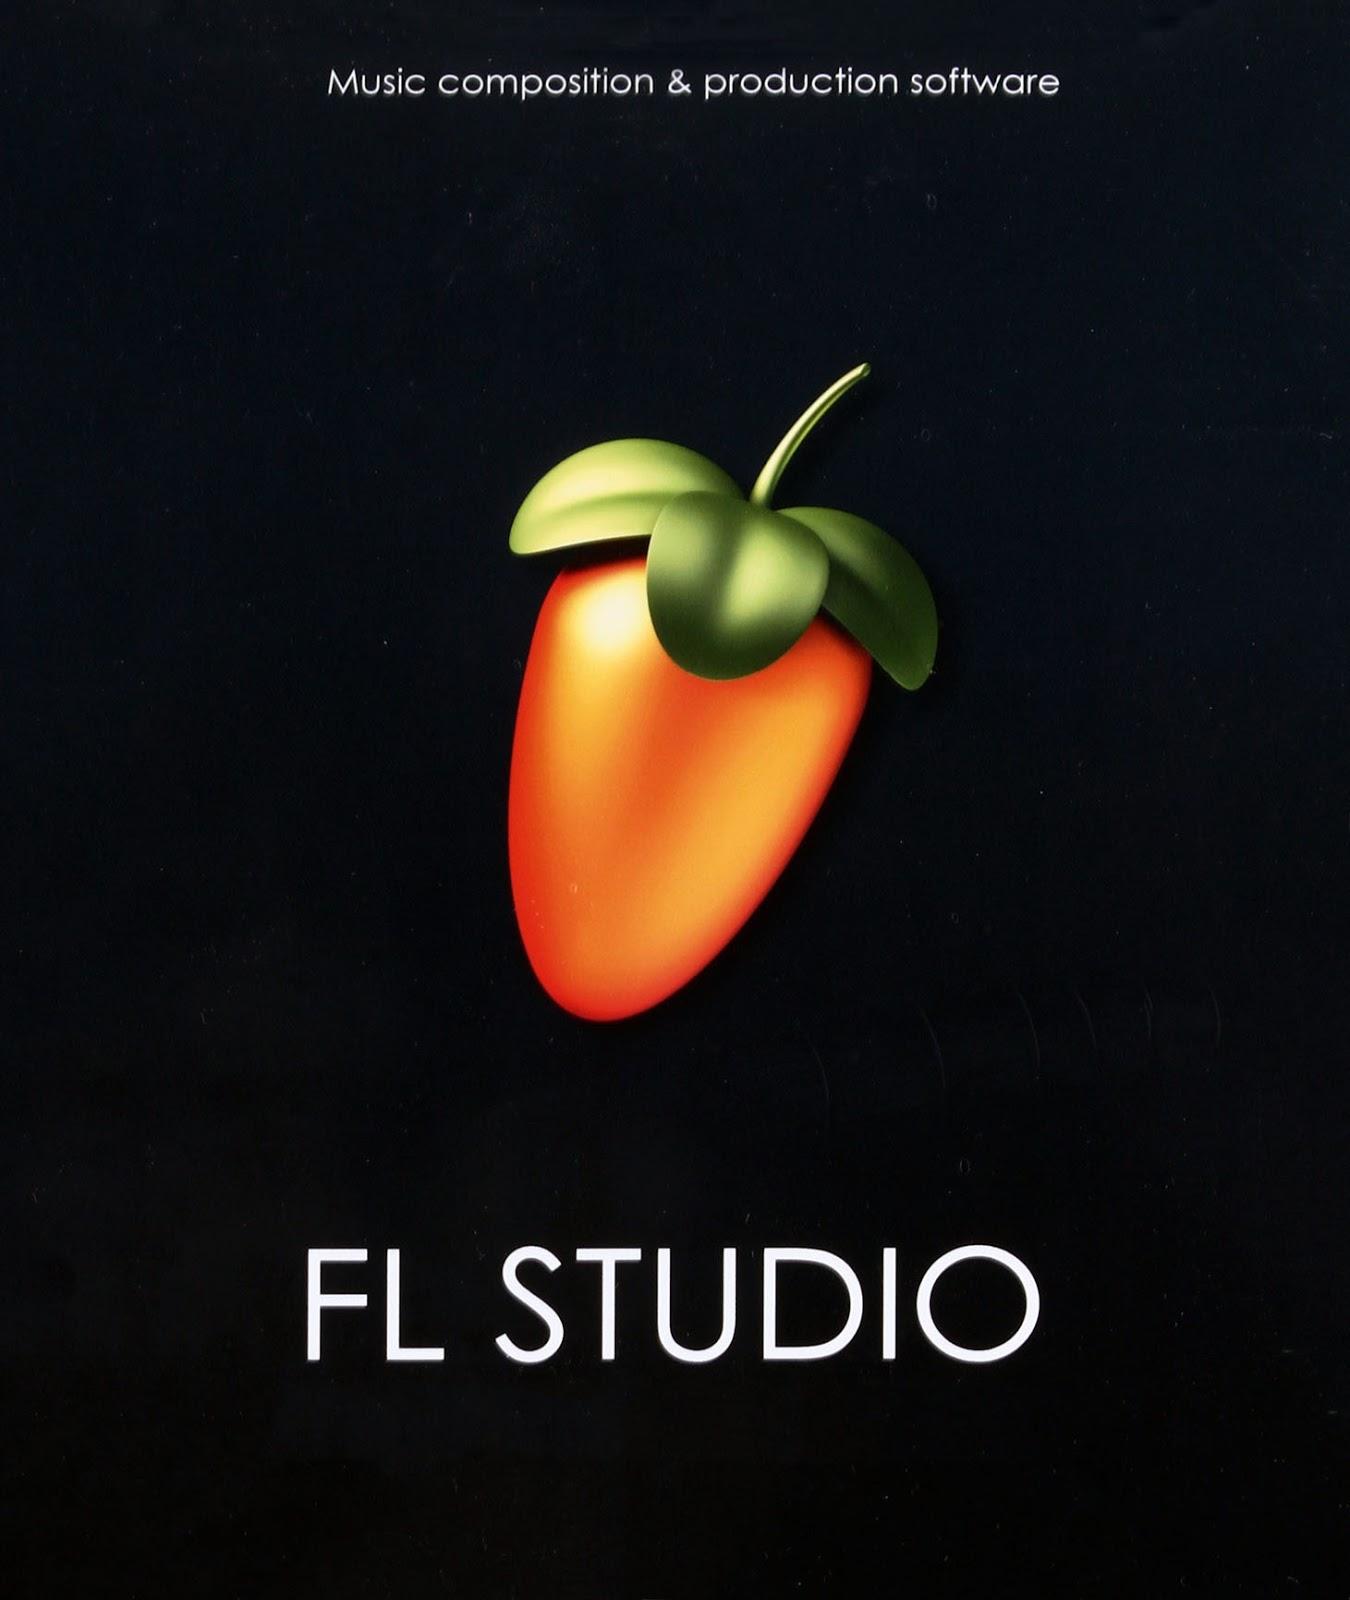 Fl studio 12.3 crack downloaddigitalfront